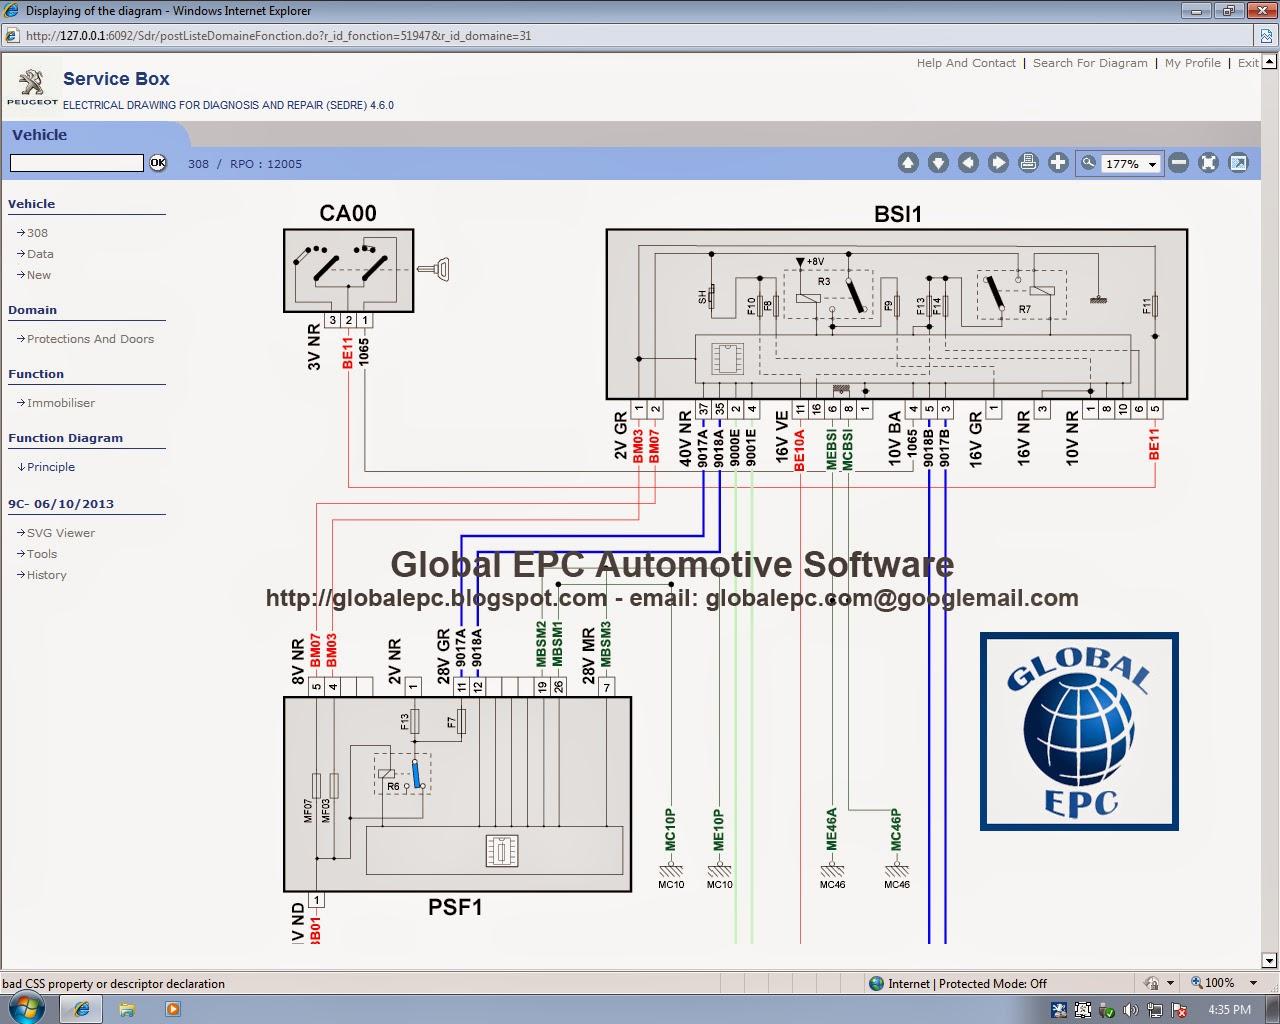 global epc automotive software: peugeot service box 11.2013 epc